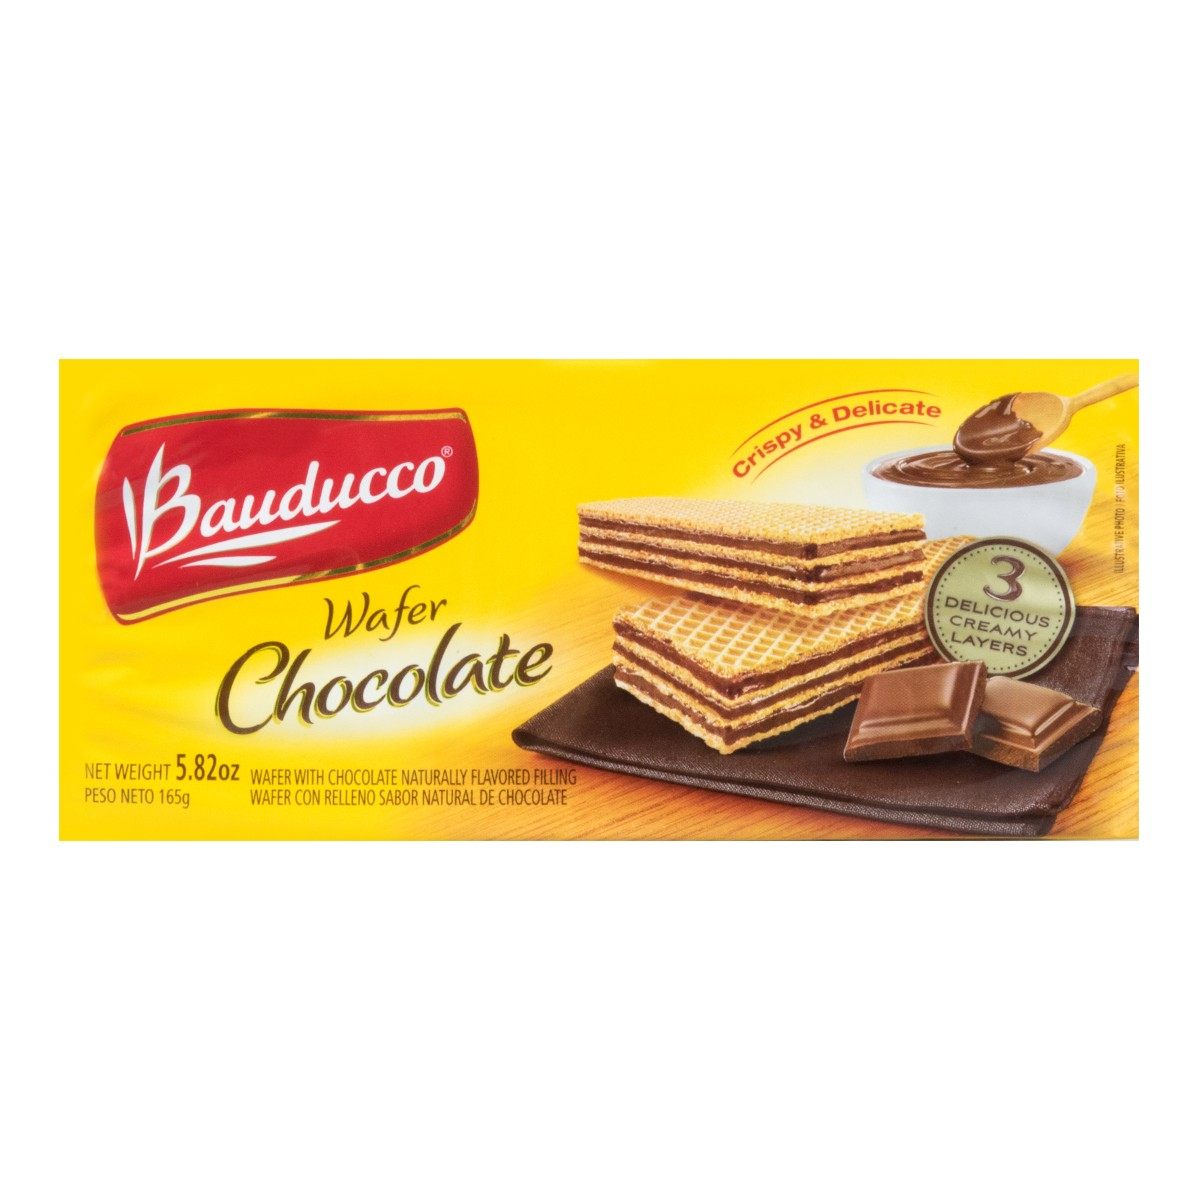 BAUDUCCO Wafer Chocolate 165g